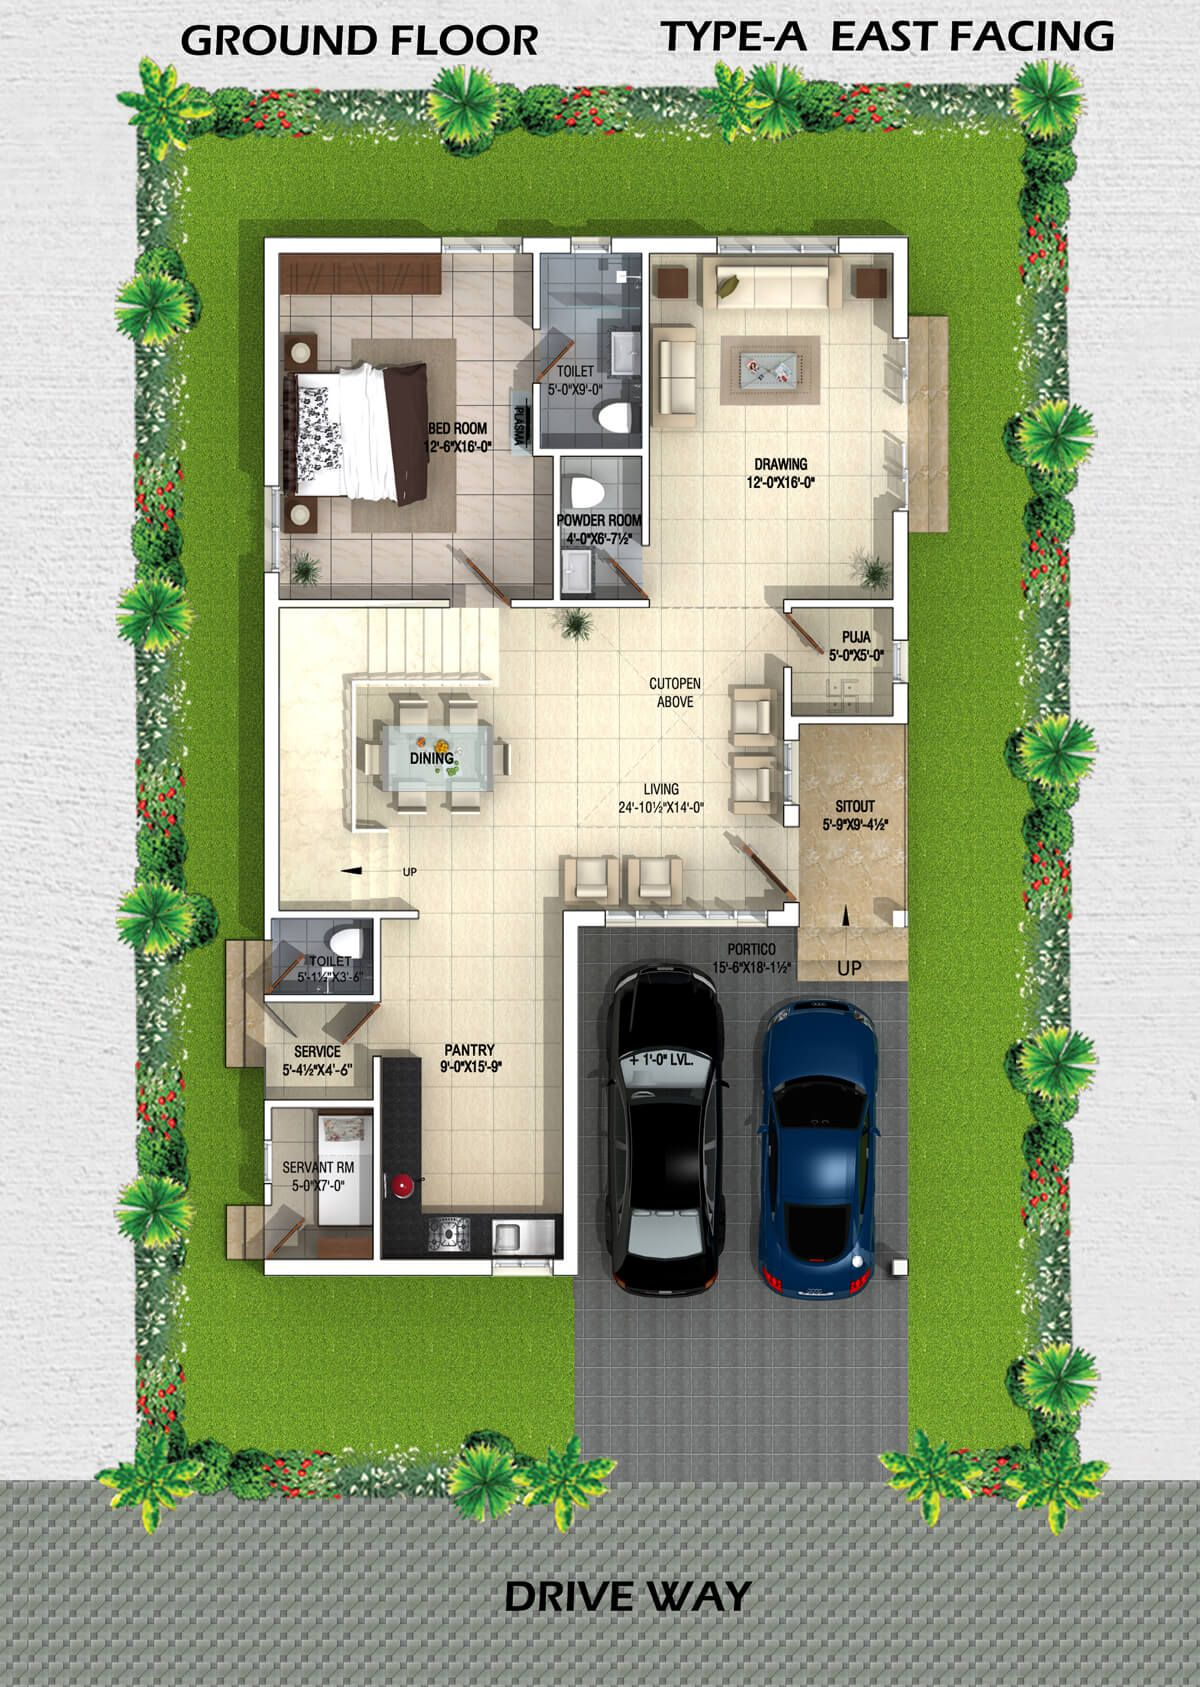 Myans Villas Type A East Facing Villas Villa, House